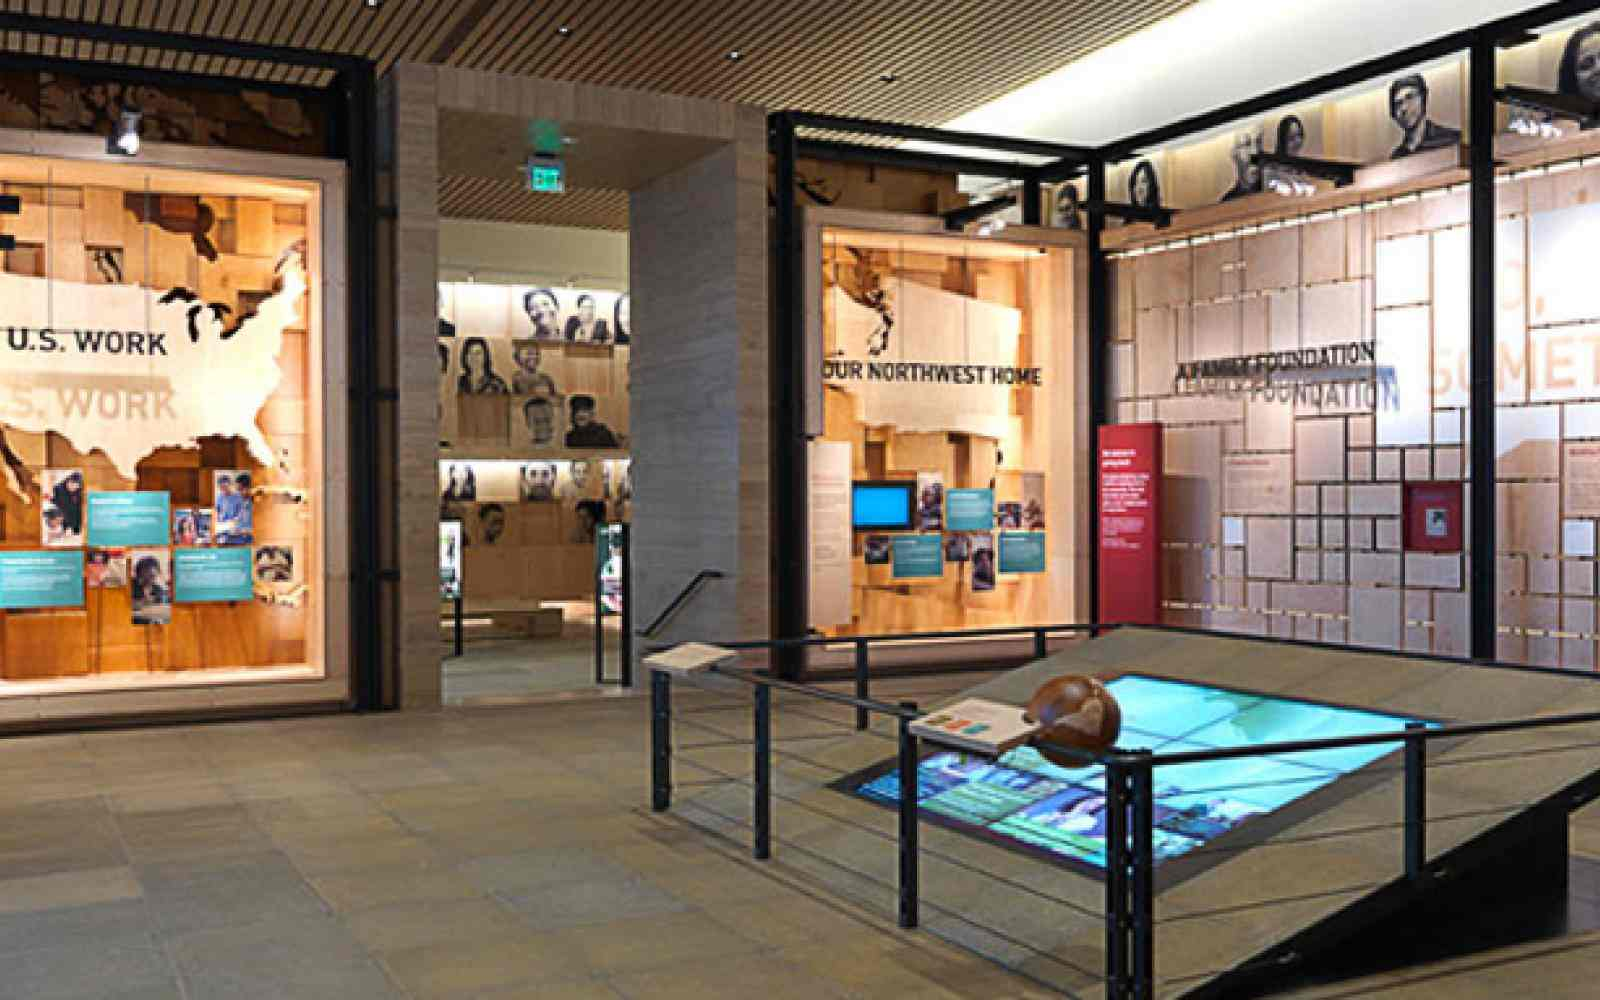 Bill & Melinda Gates Foundation Now Open to Visitors | Ashoka